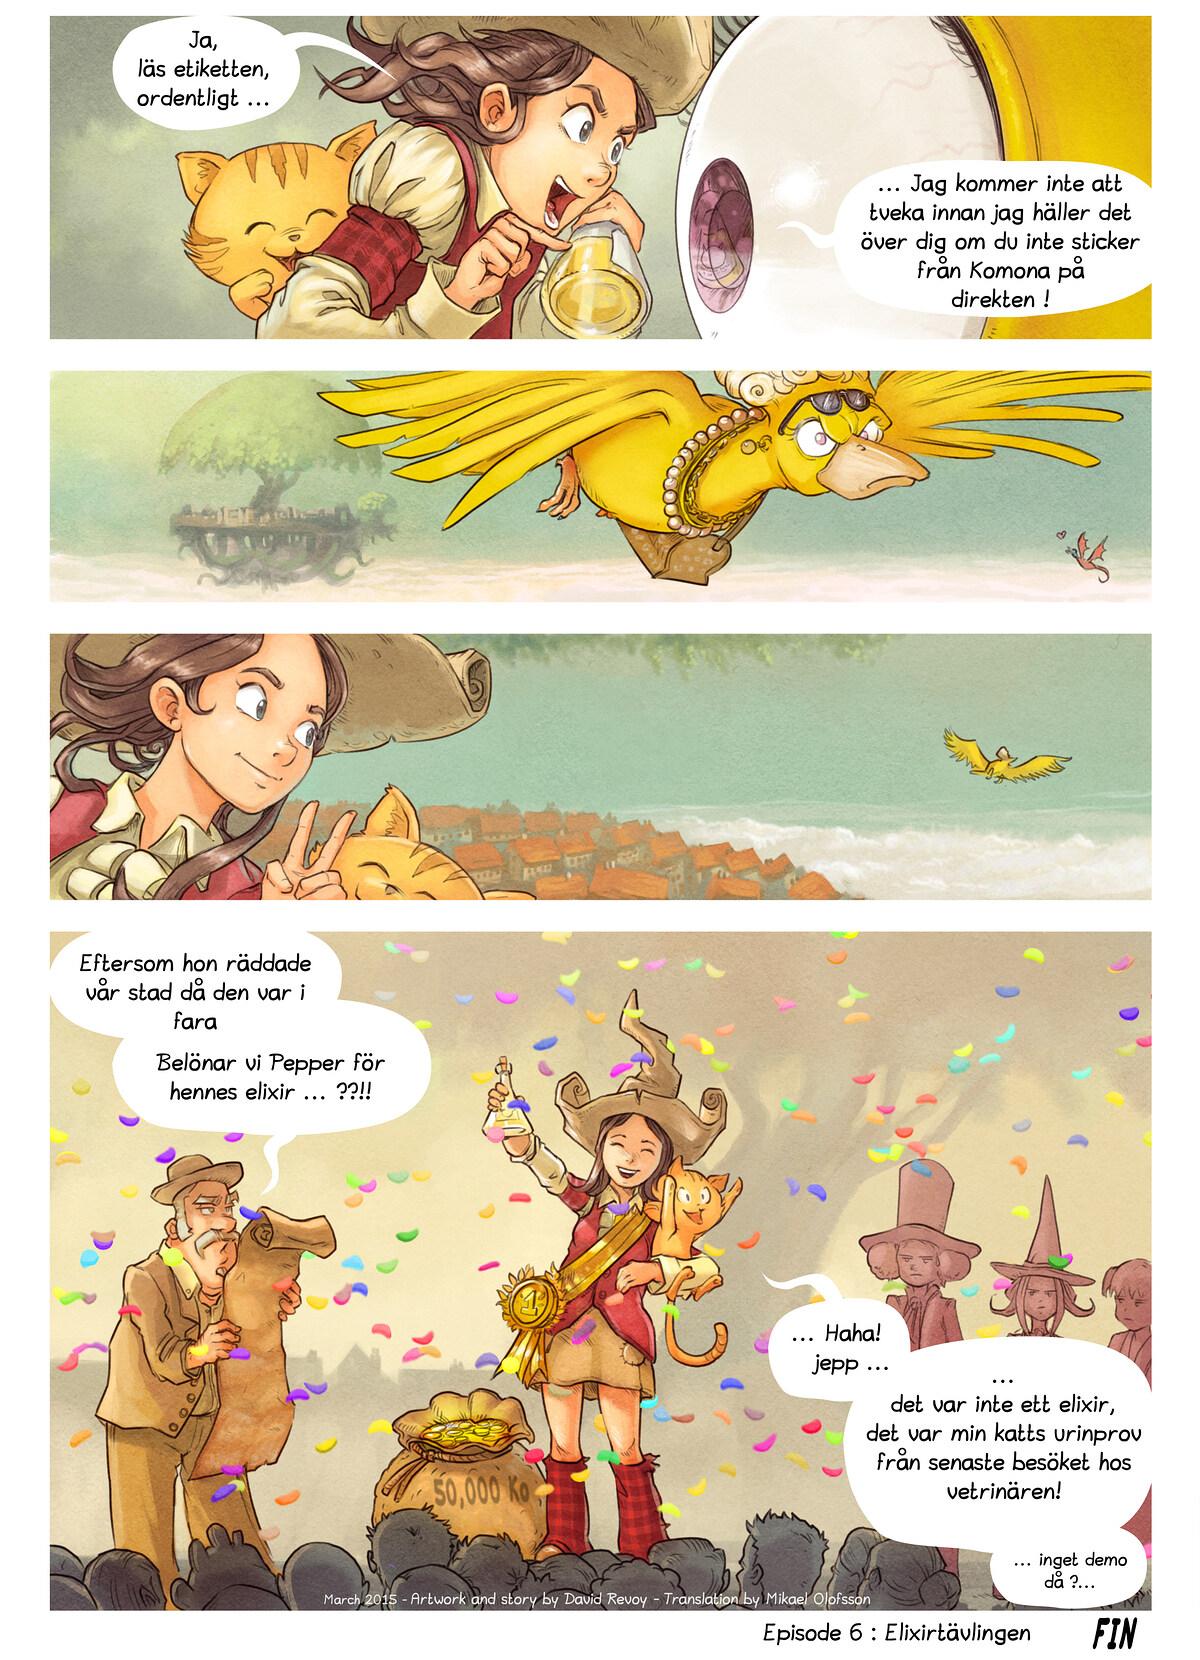 Episode 6: Elixrtävlingen, Page 9